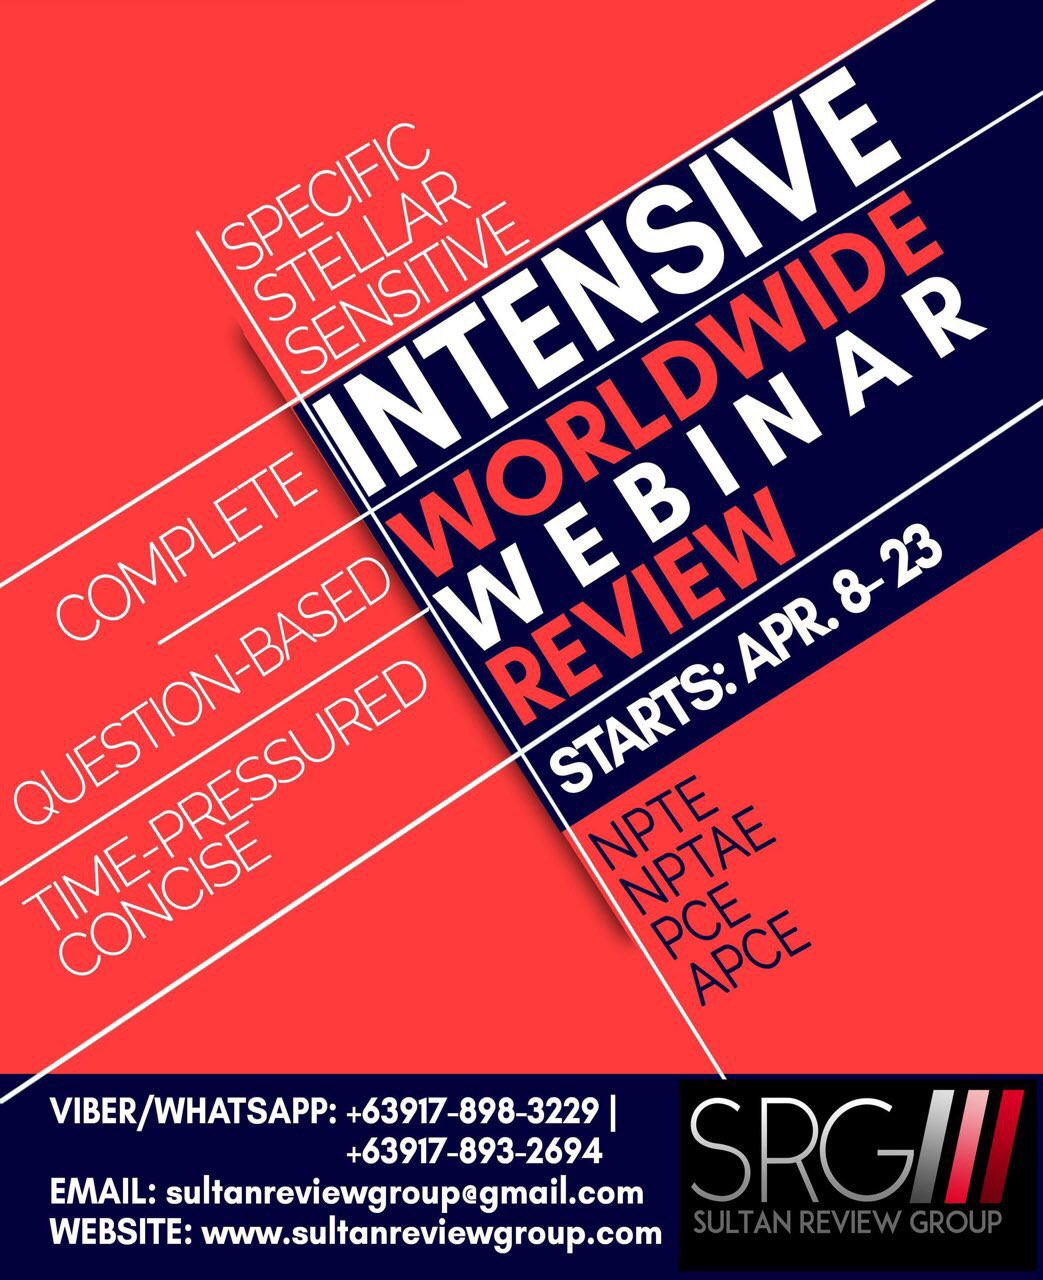 INTENSIVE WEB 9